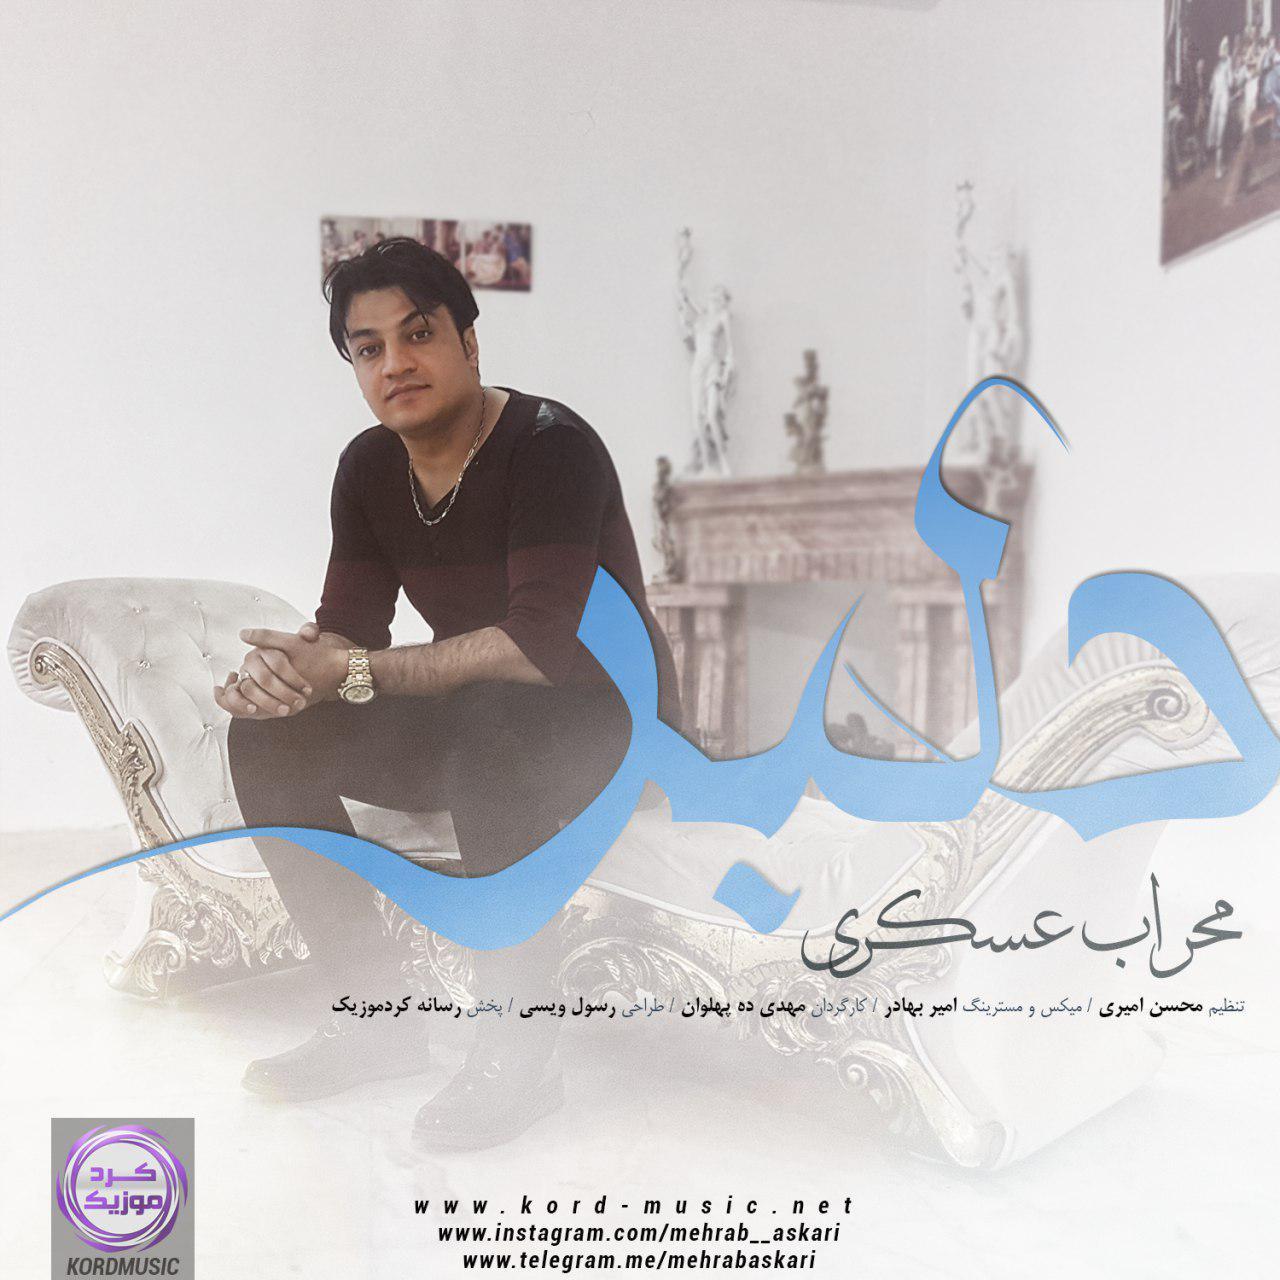 http://dl2.kord-music.net/1396/01/12/Mehrab%20Askari.jpg